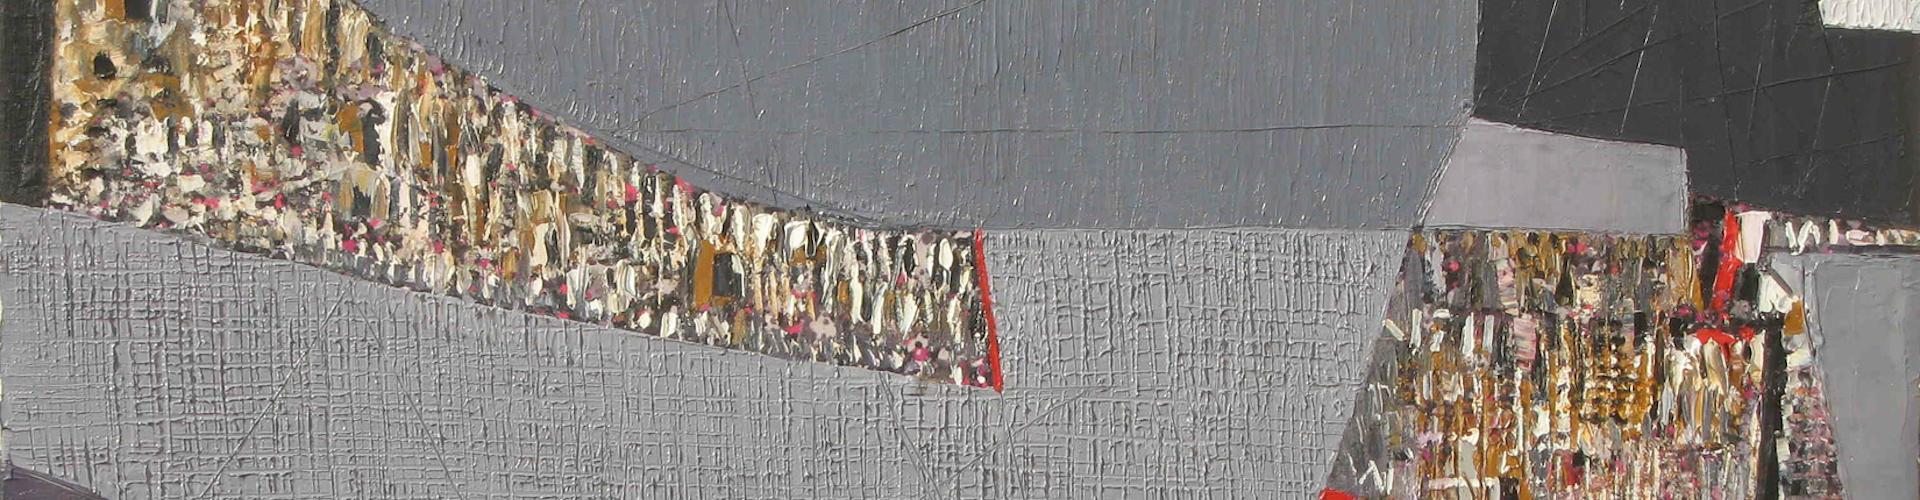 Claudio Gotti - Galleria d'Arte - D'Amico Arreda